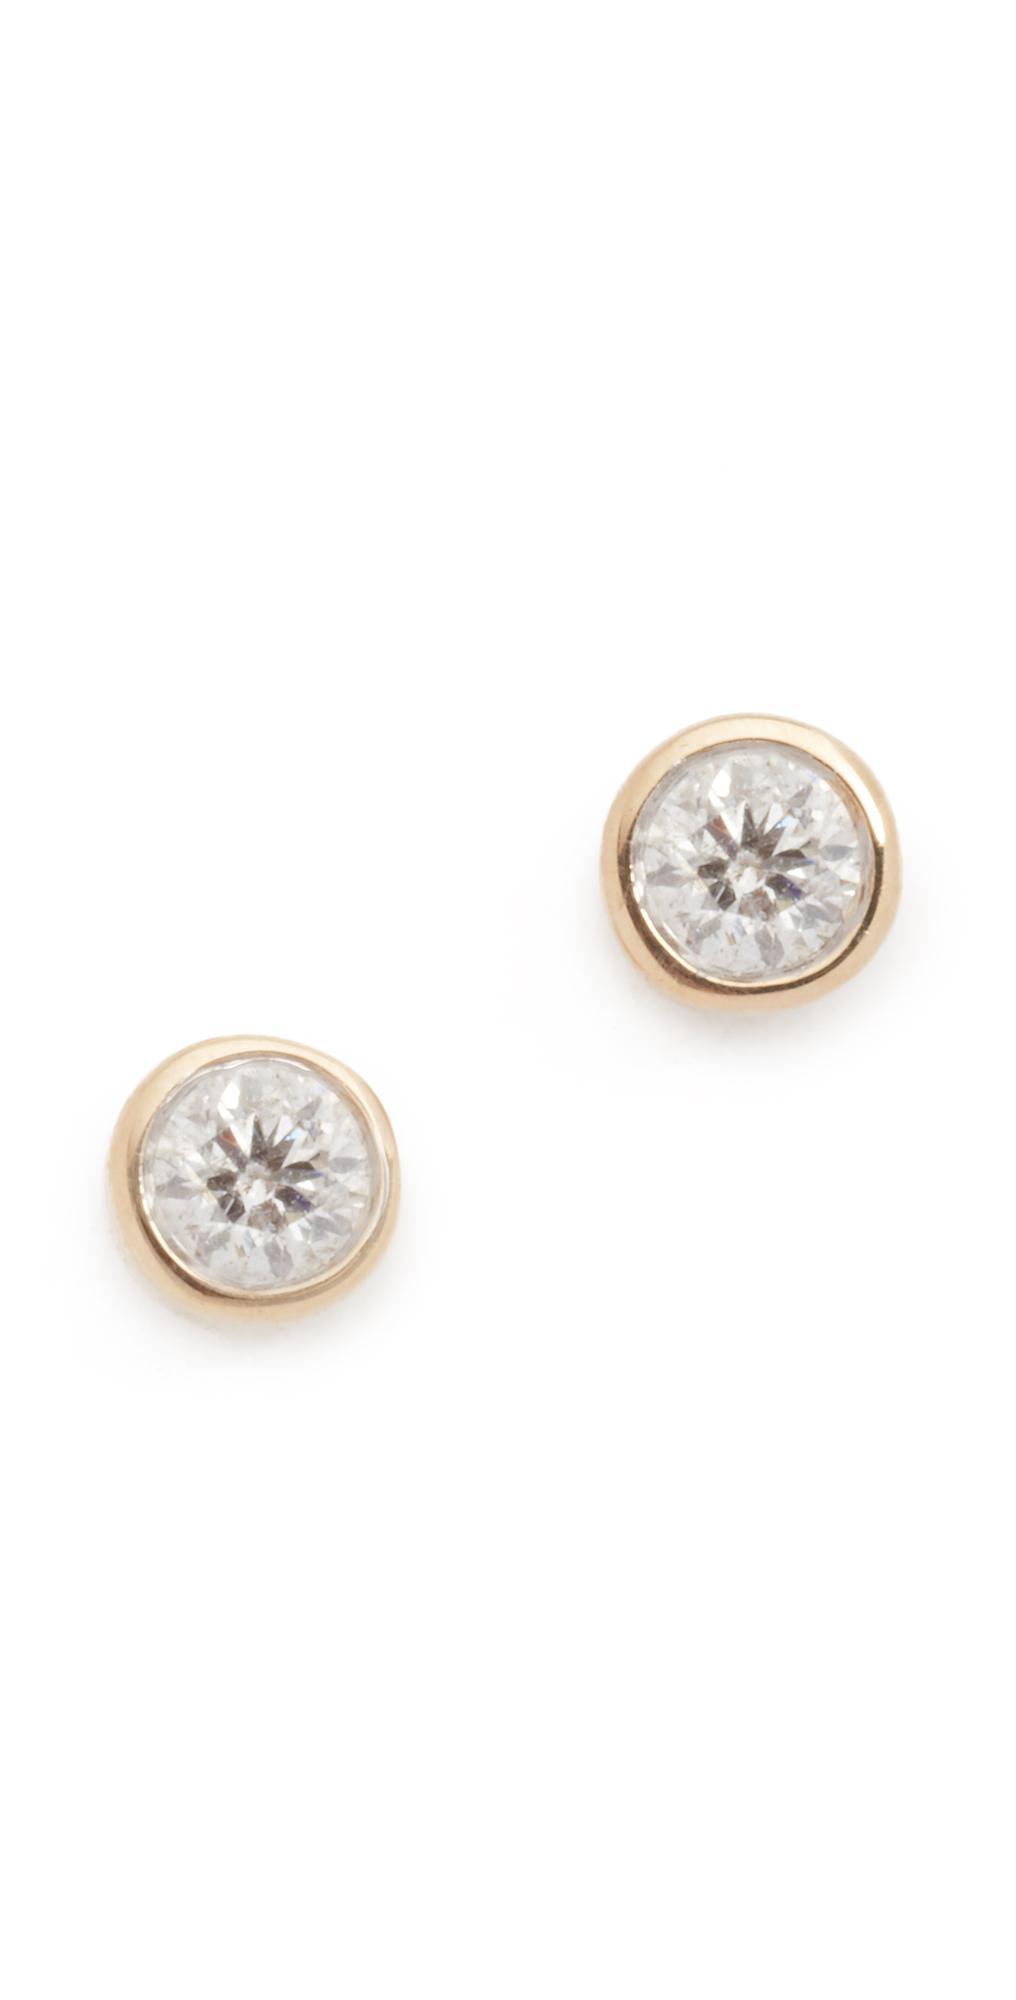 14k Gold Single Diamond Stud Earrings Adina Reyter